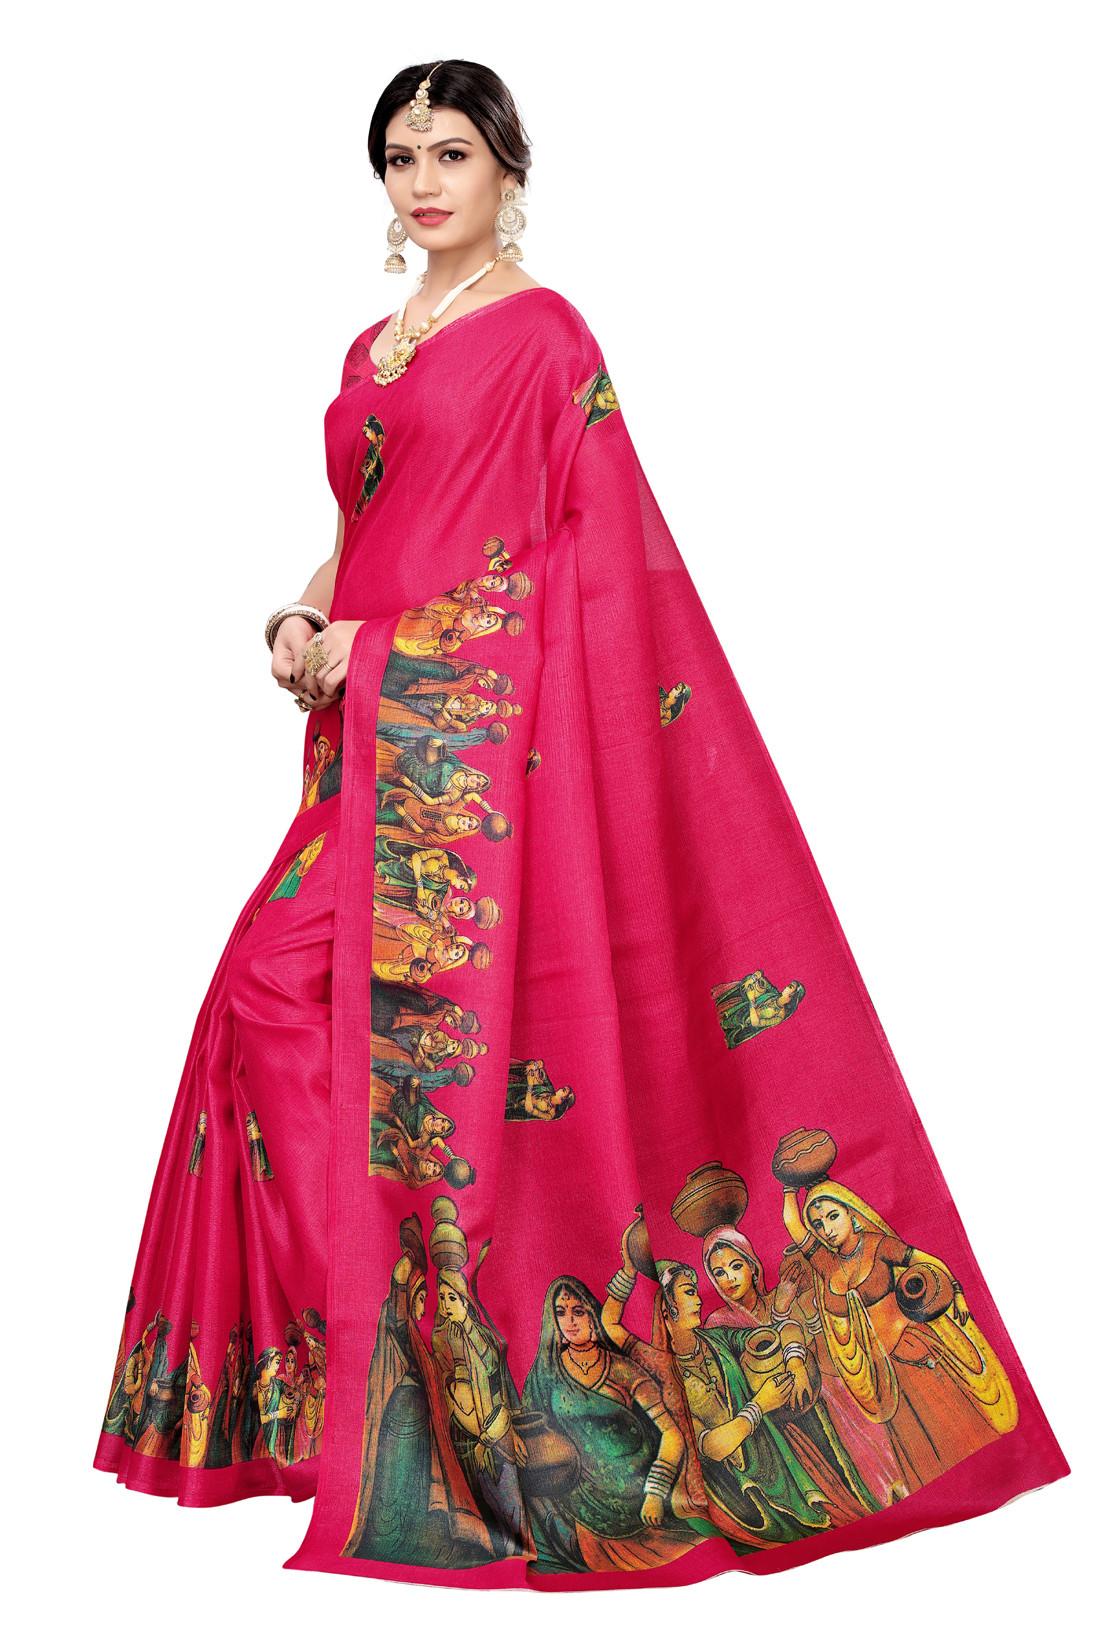 Festive Wear And Daily Wear Printed Khadi Saree